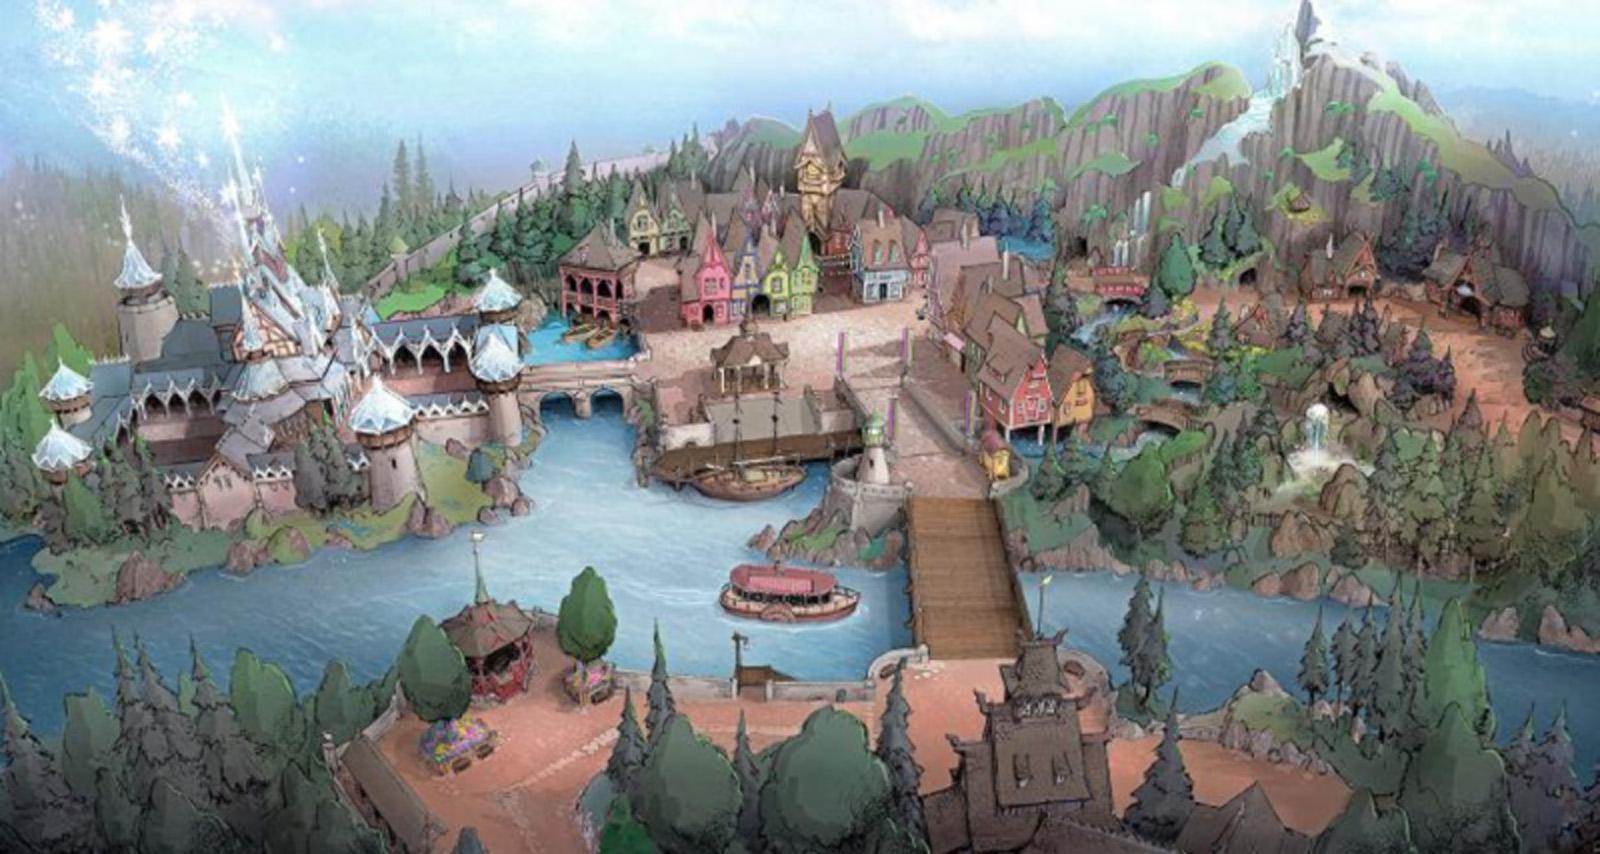 Arendelle comes to Tokyo Disney Sea